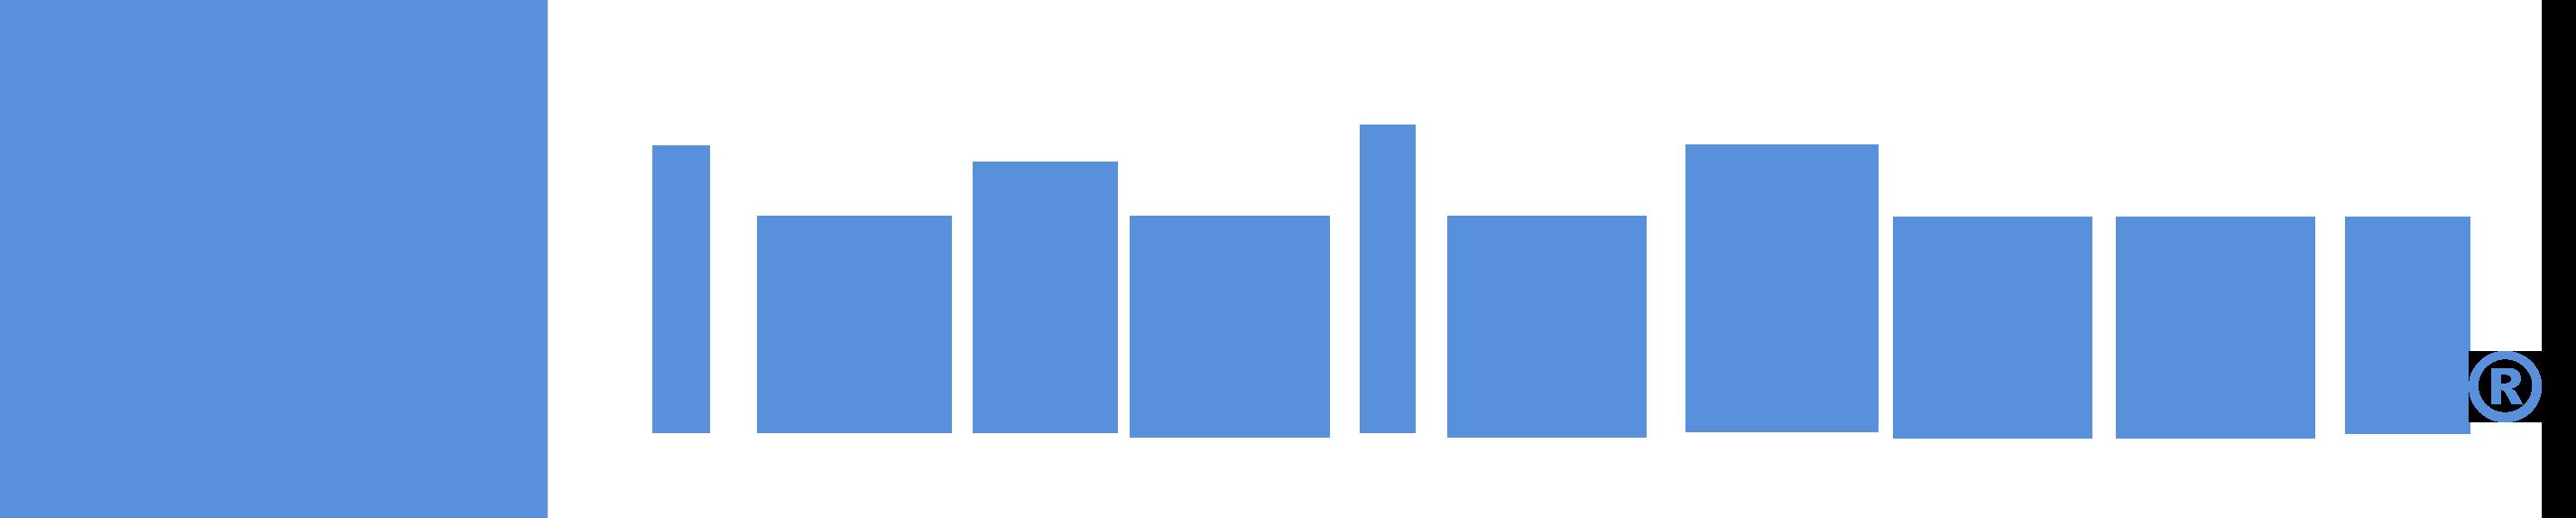 IntelePeer Cloud Communications